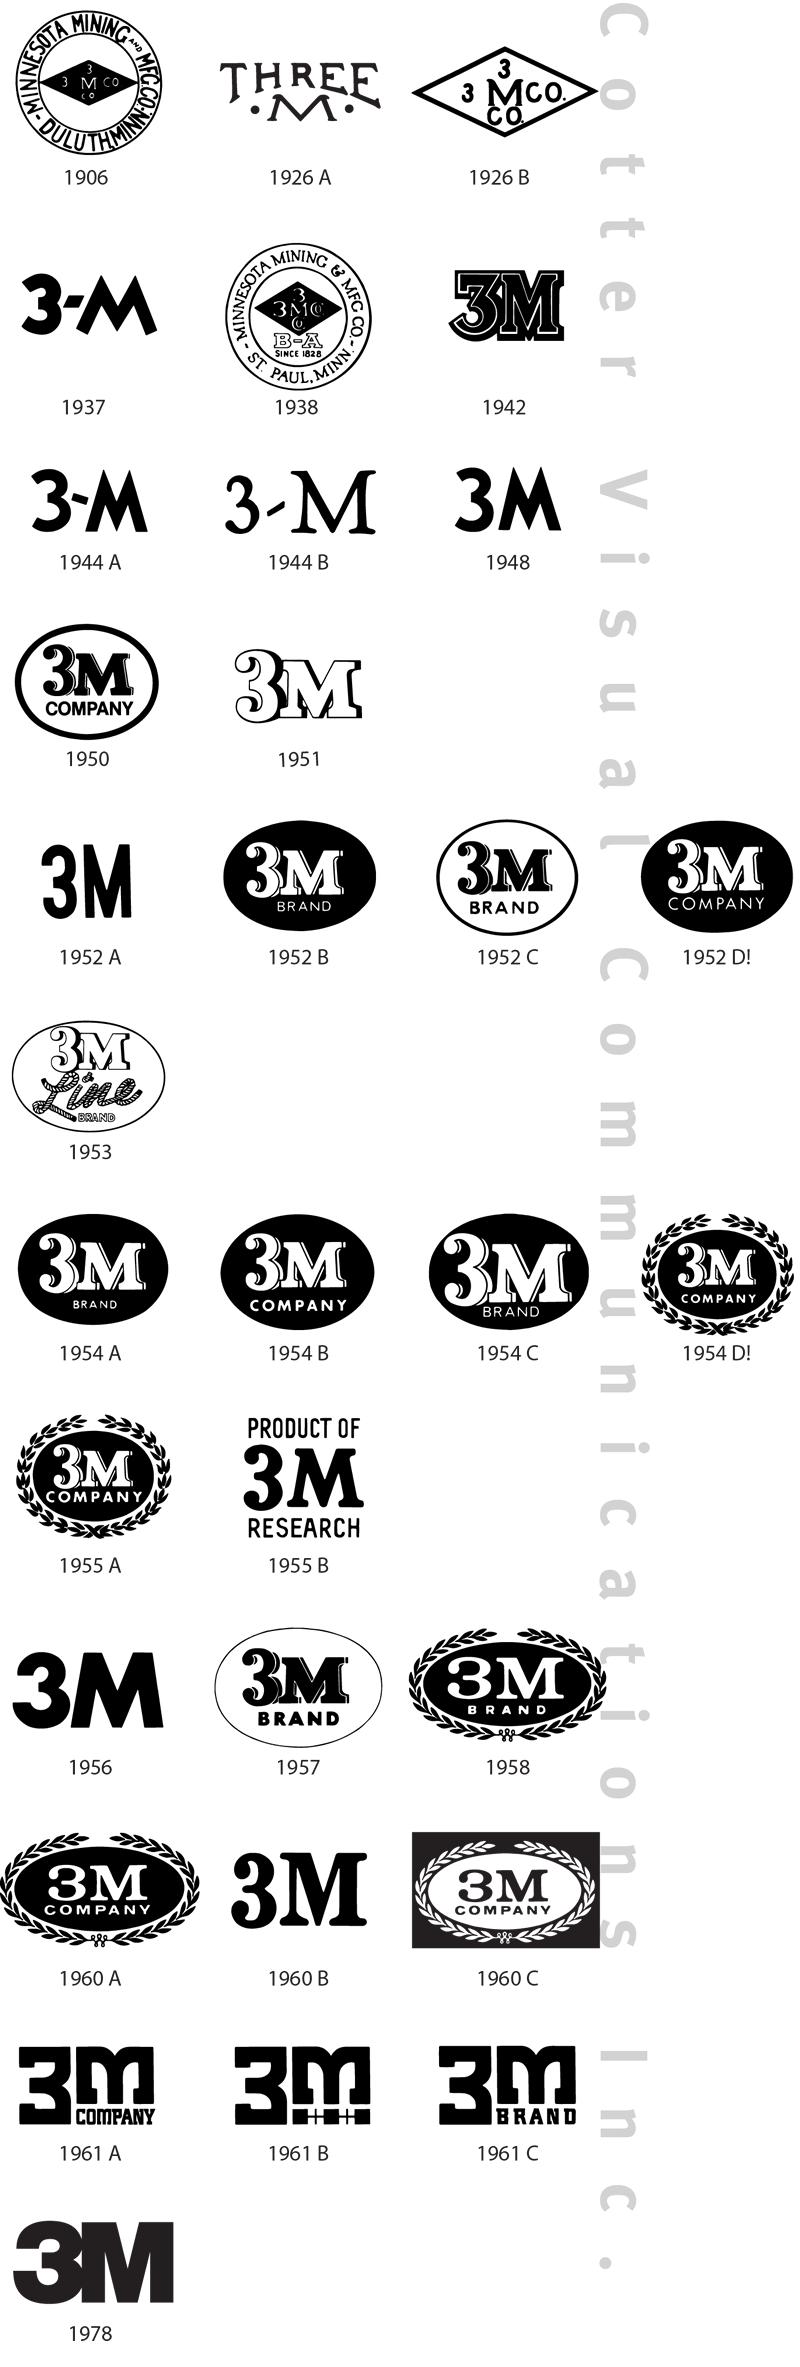 3m logo evolution